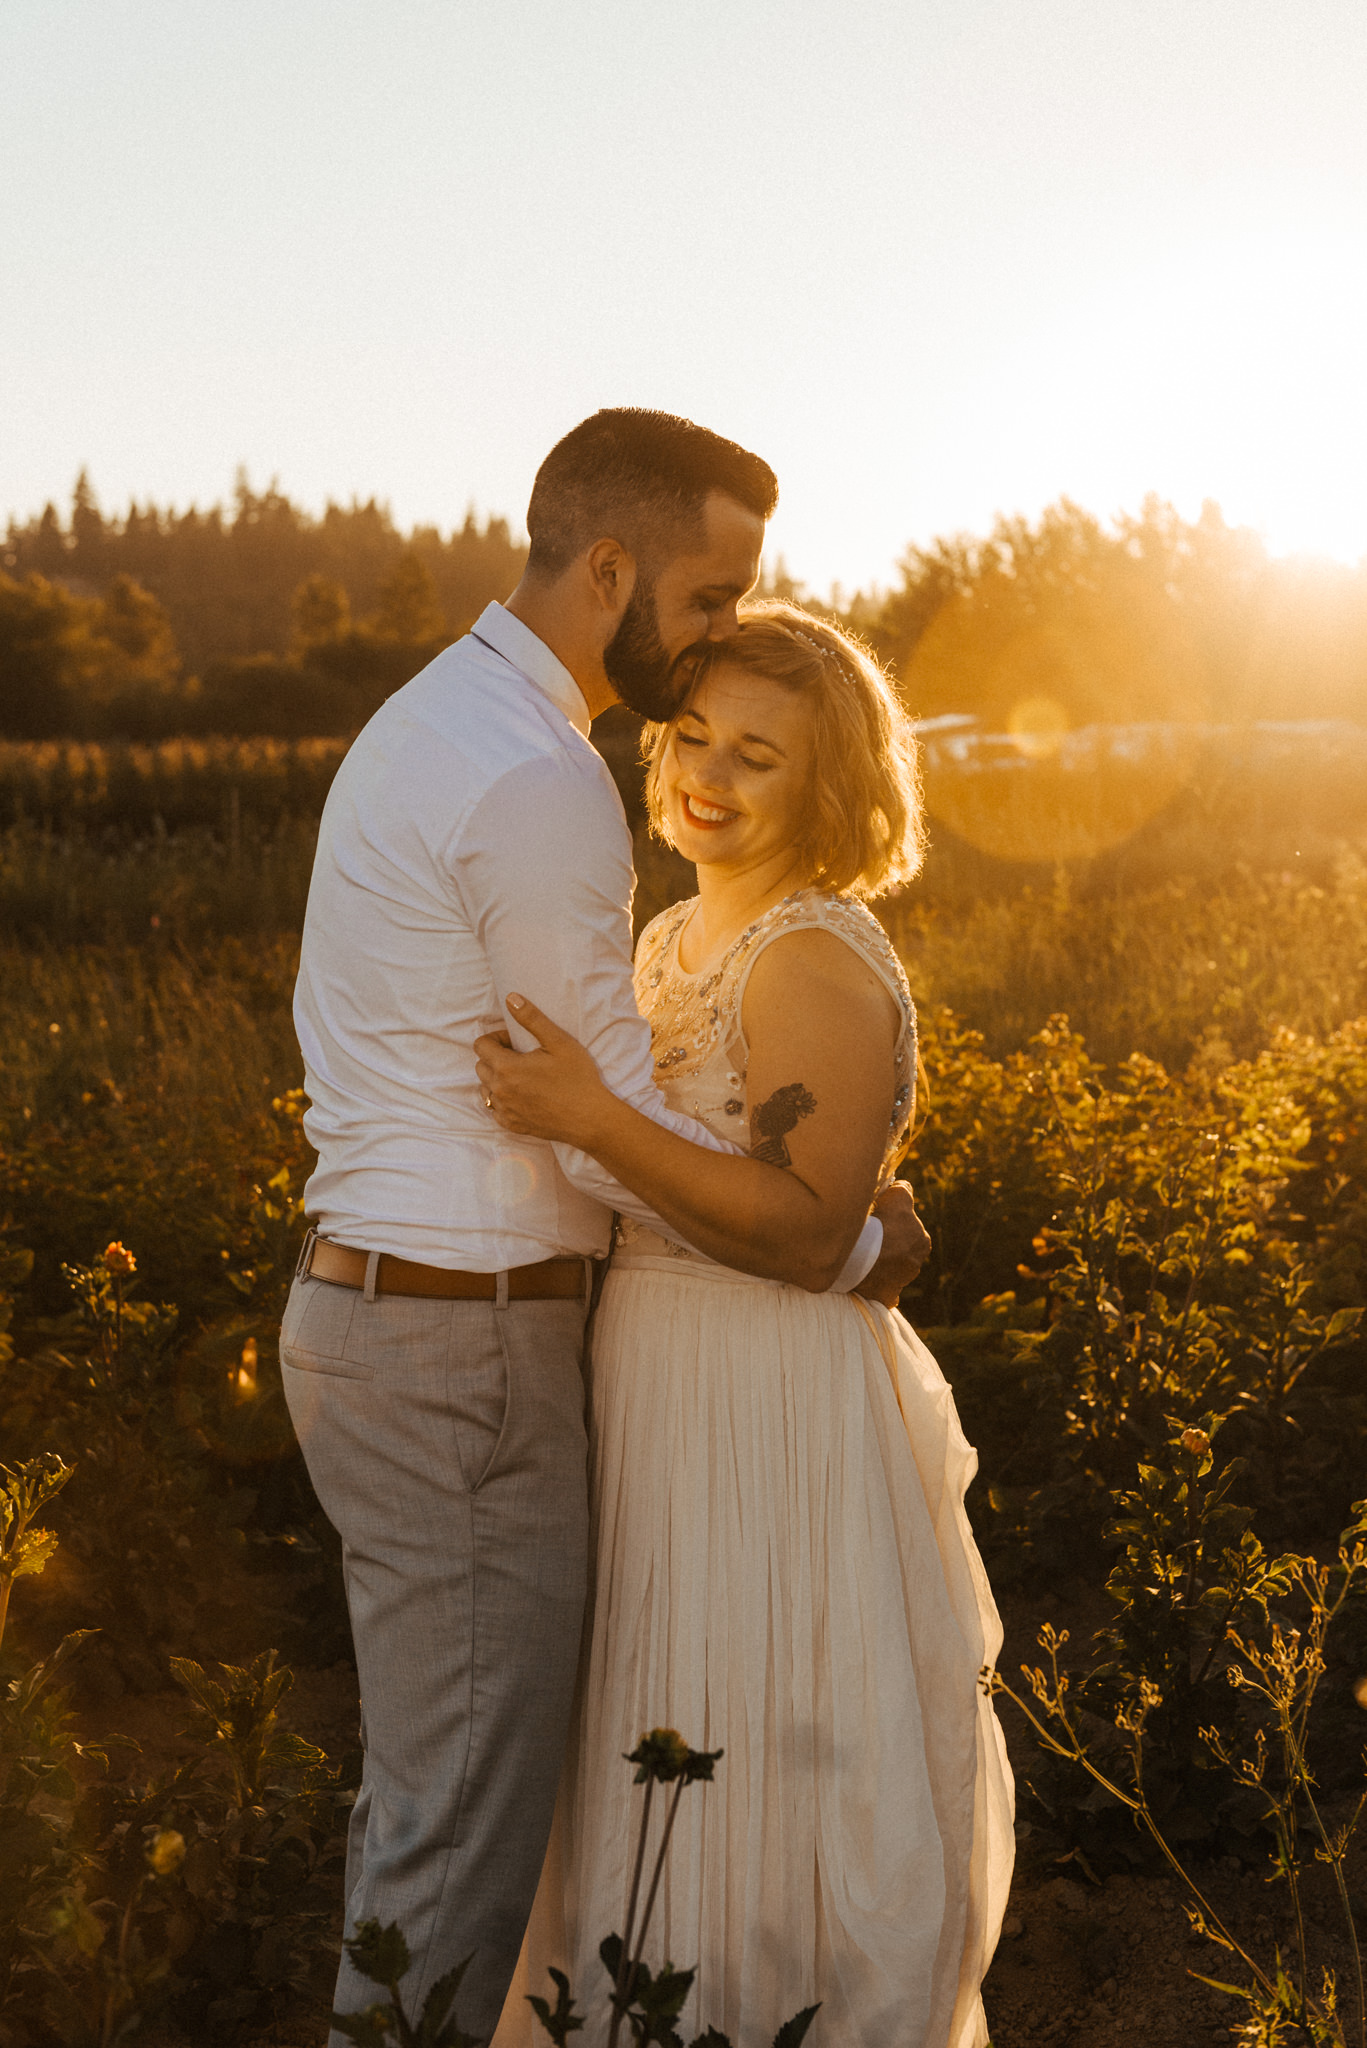 Amy Steven Seattle Wedding Photographer Vishal Goklani_062.jpg